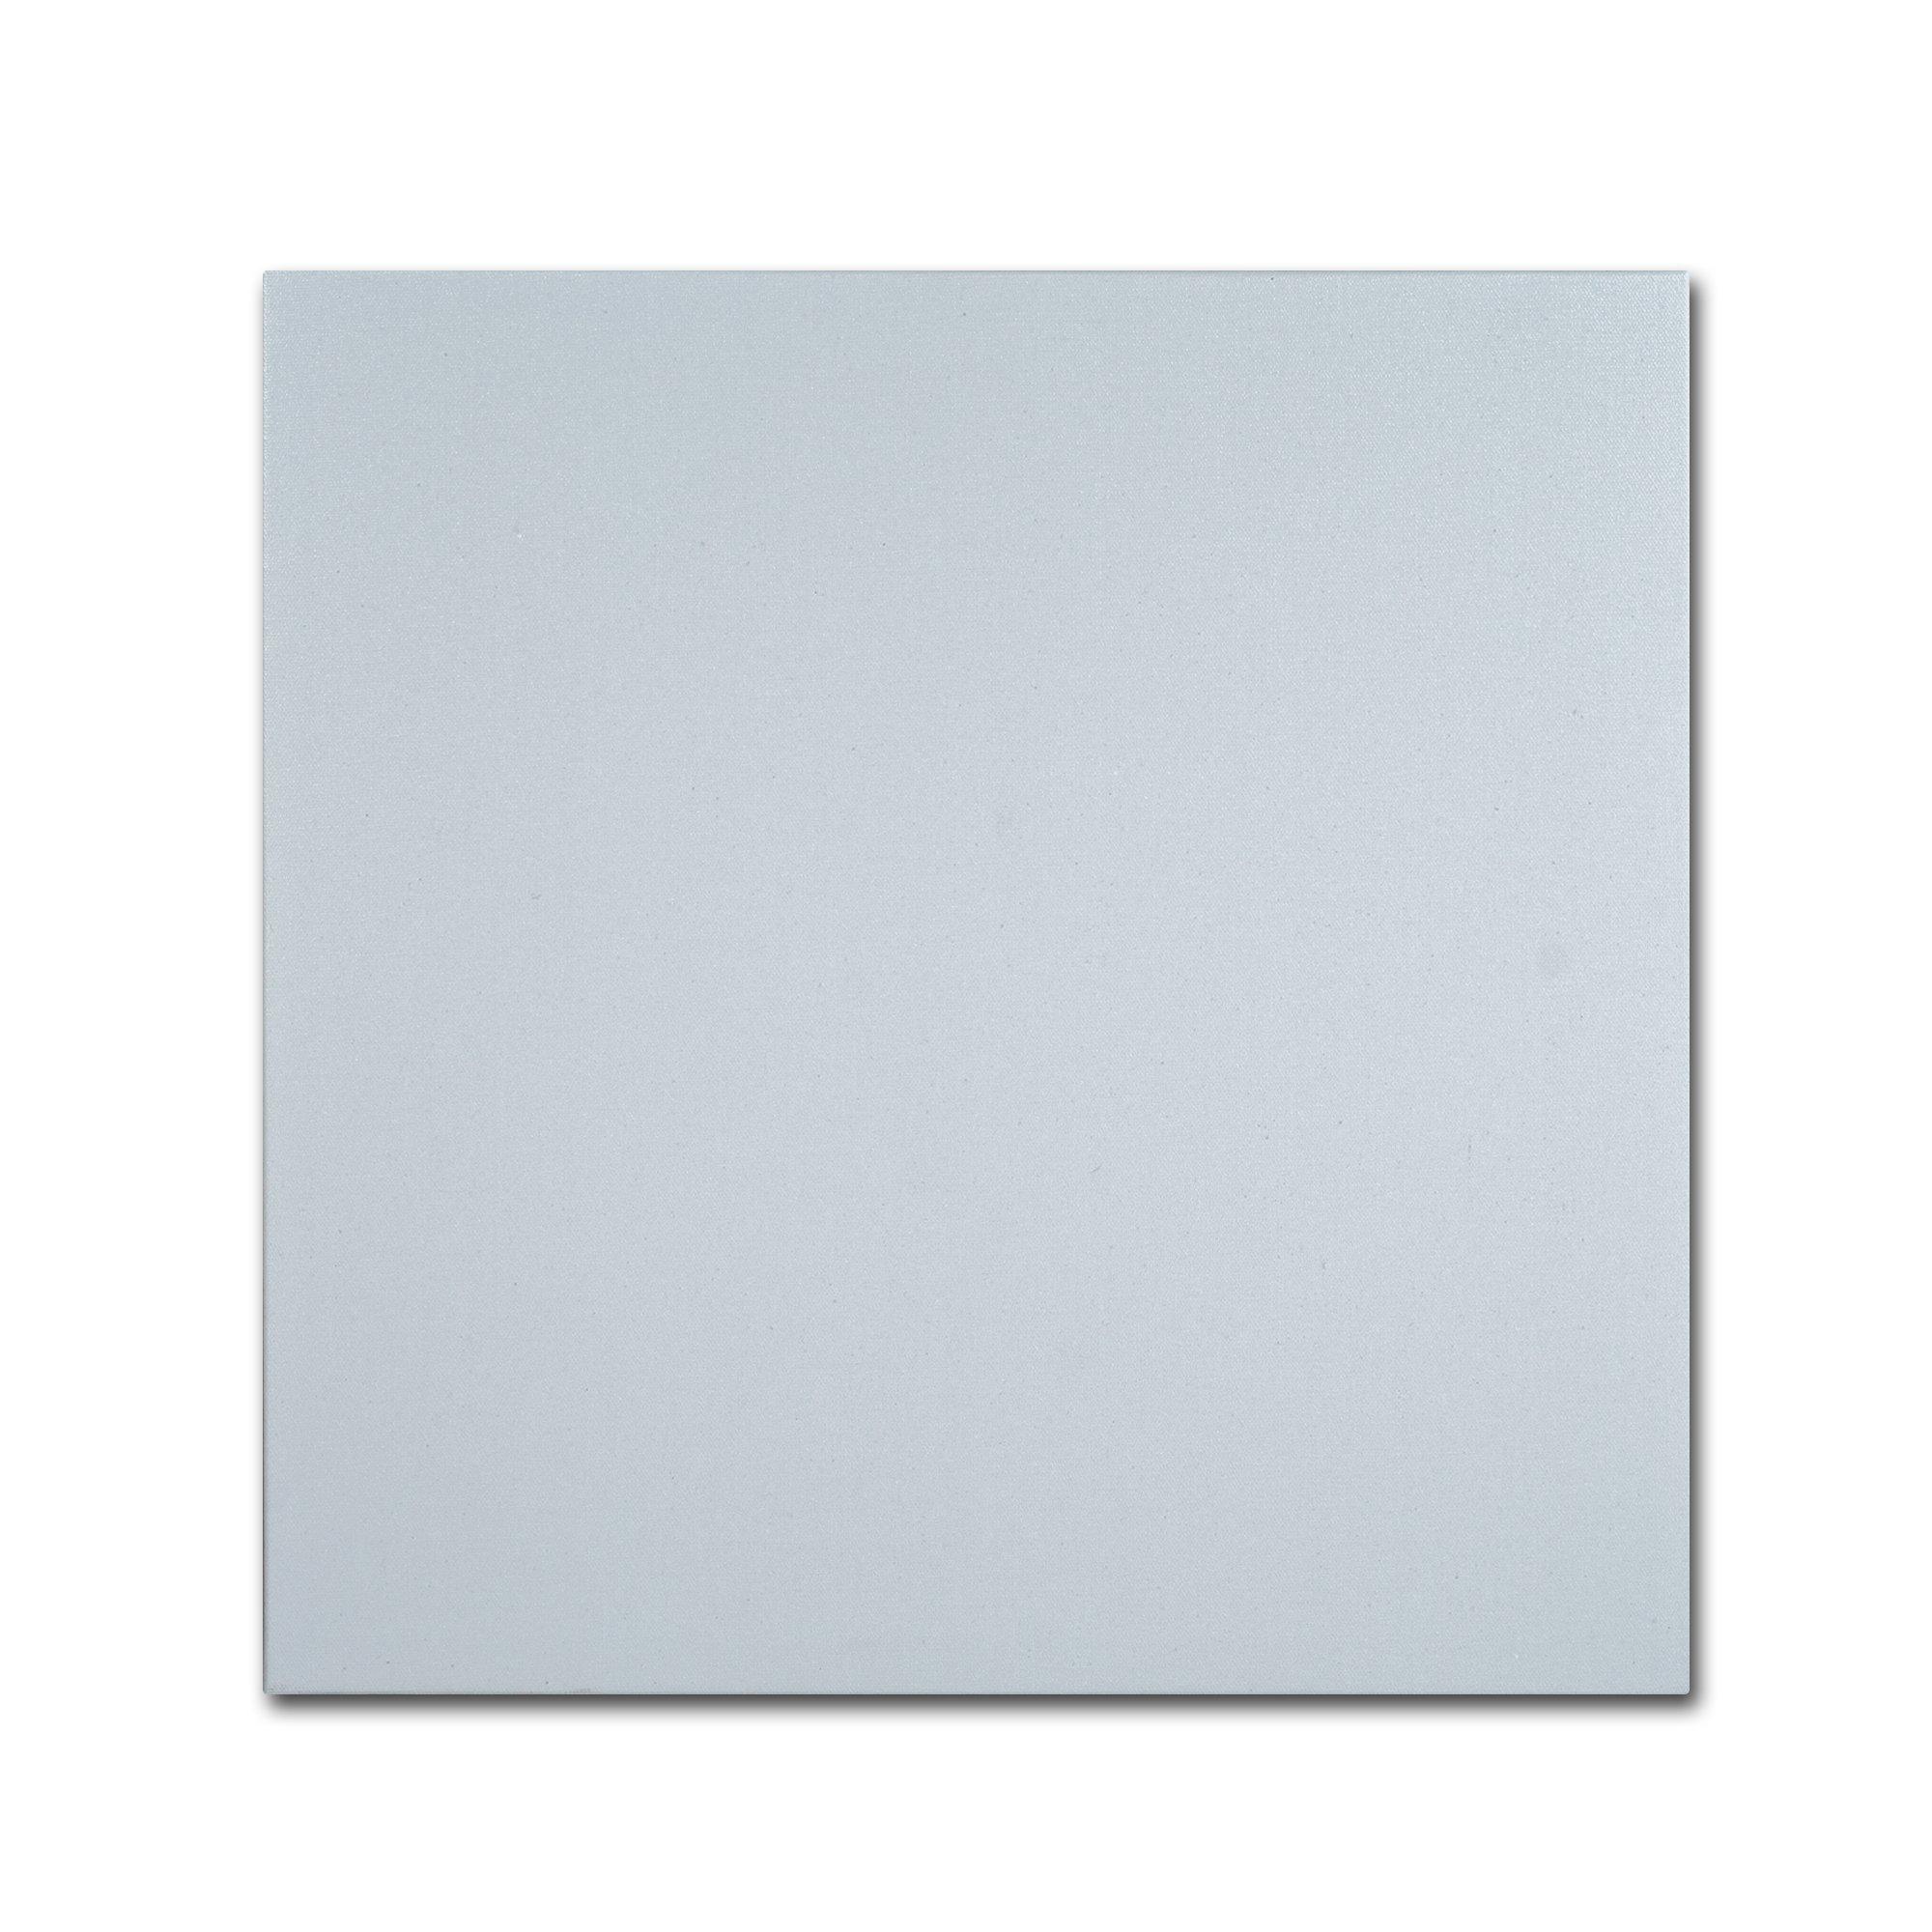 Trademark Fine Art Professional Blank Canvas on Stretcher Bars, 35'' x 35'', White by Trademark Fine Art